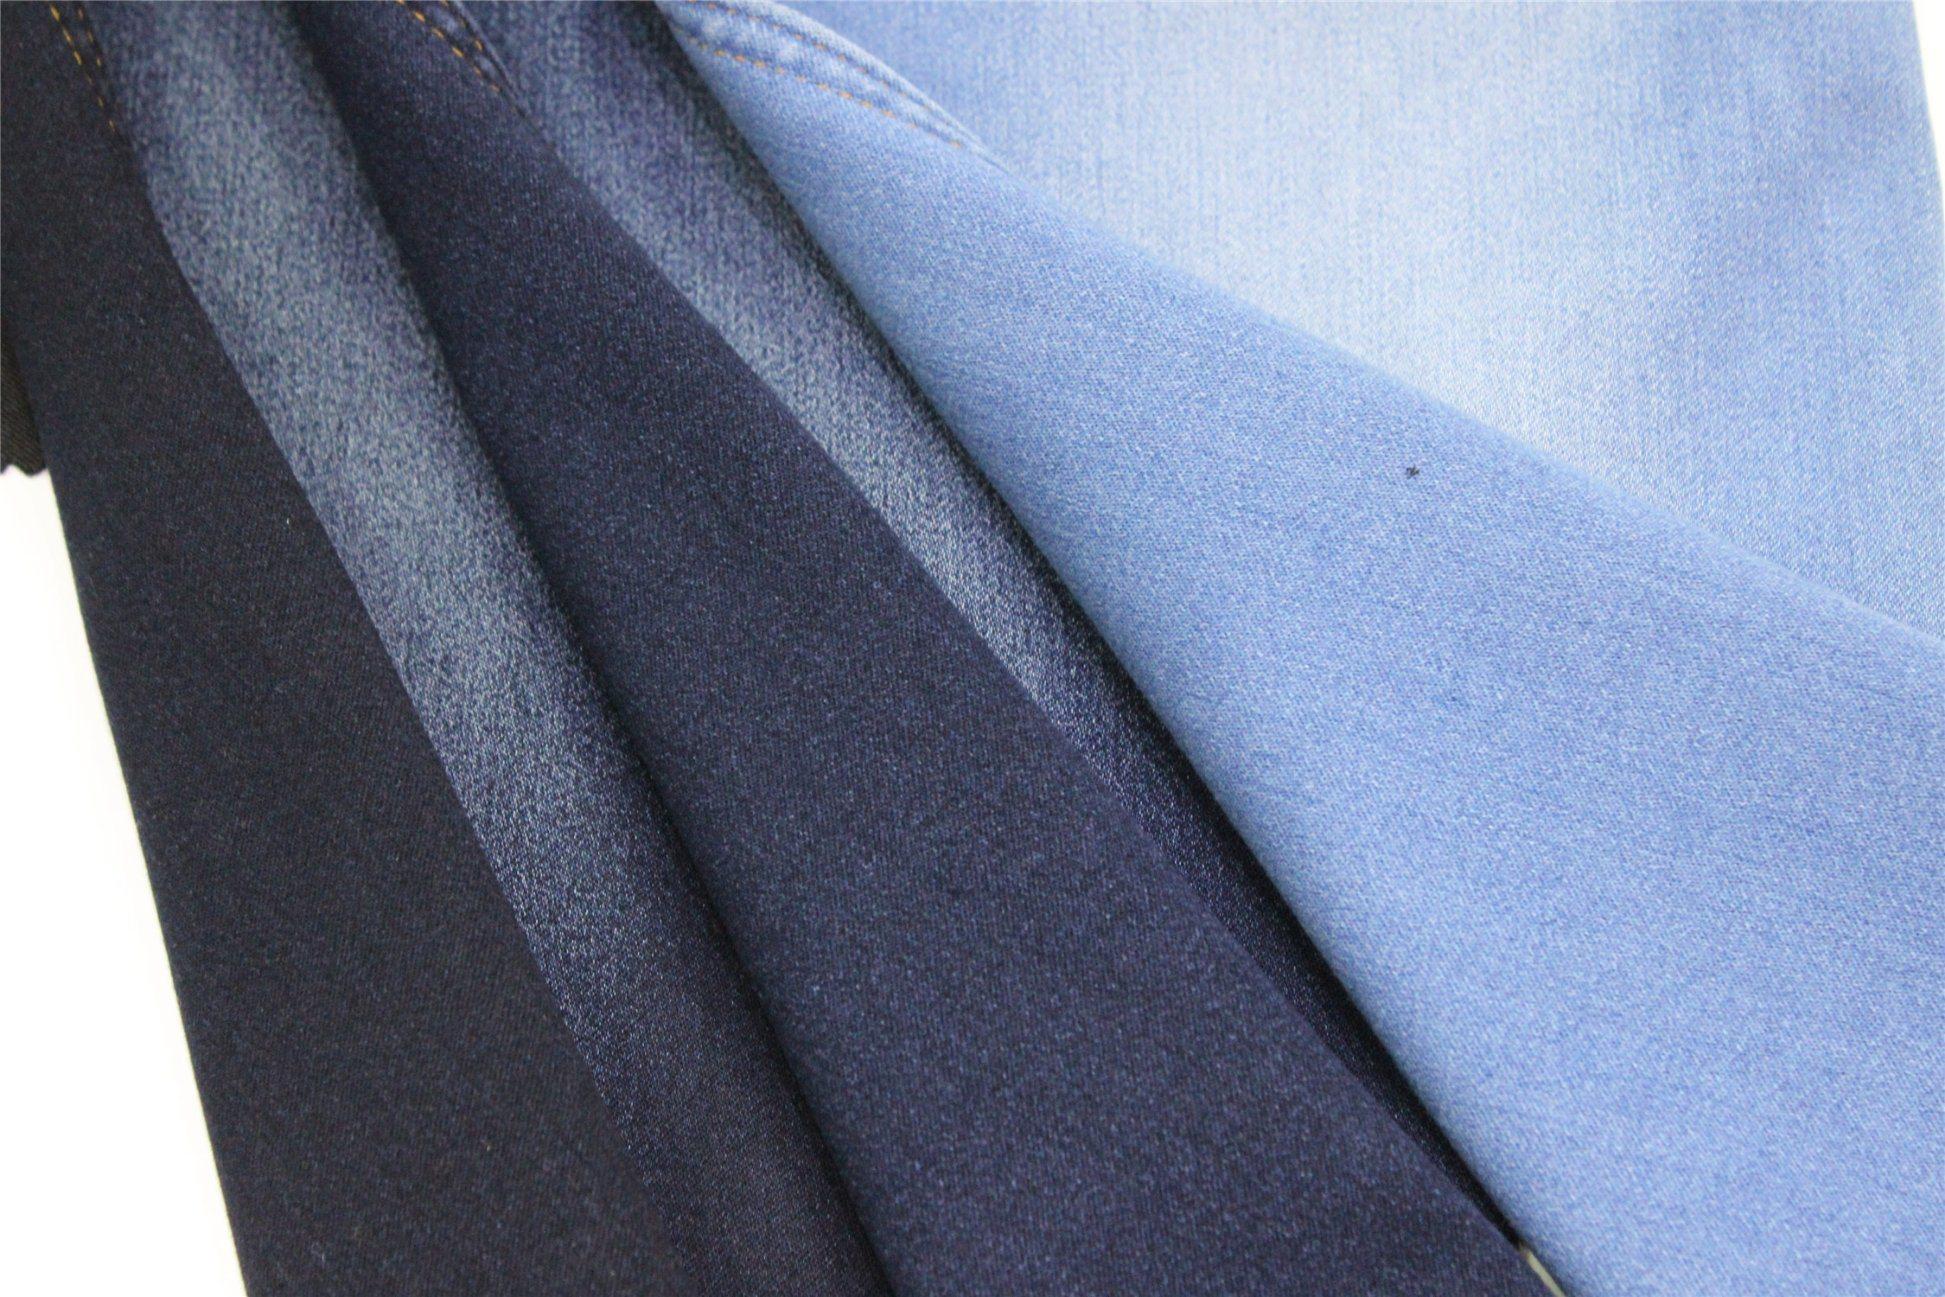 Rayon Polyester Cotton Spandex Denim